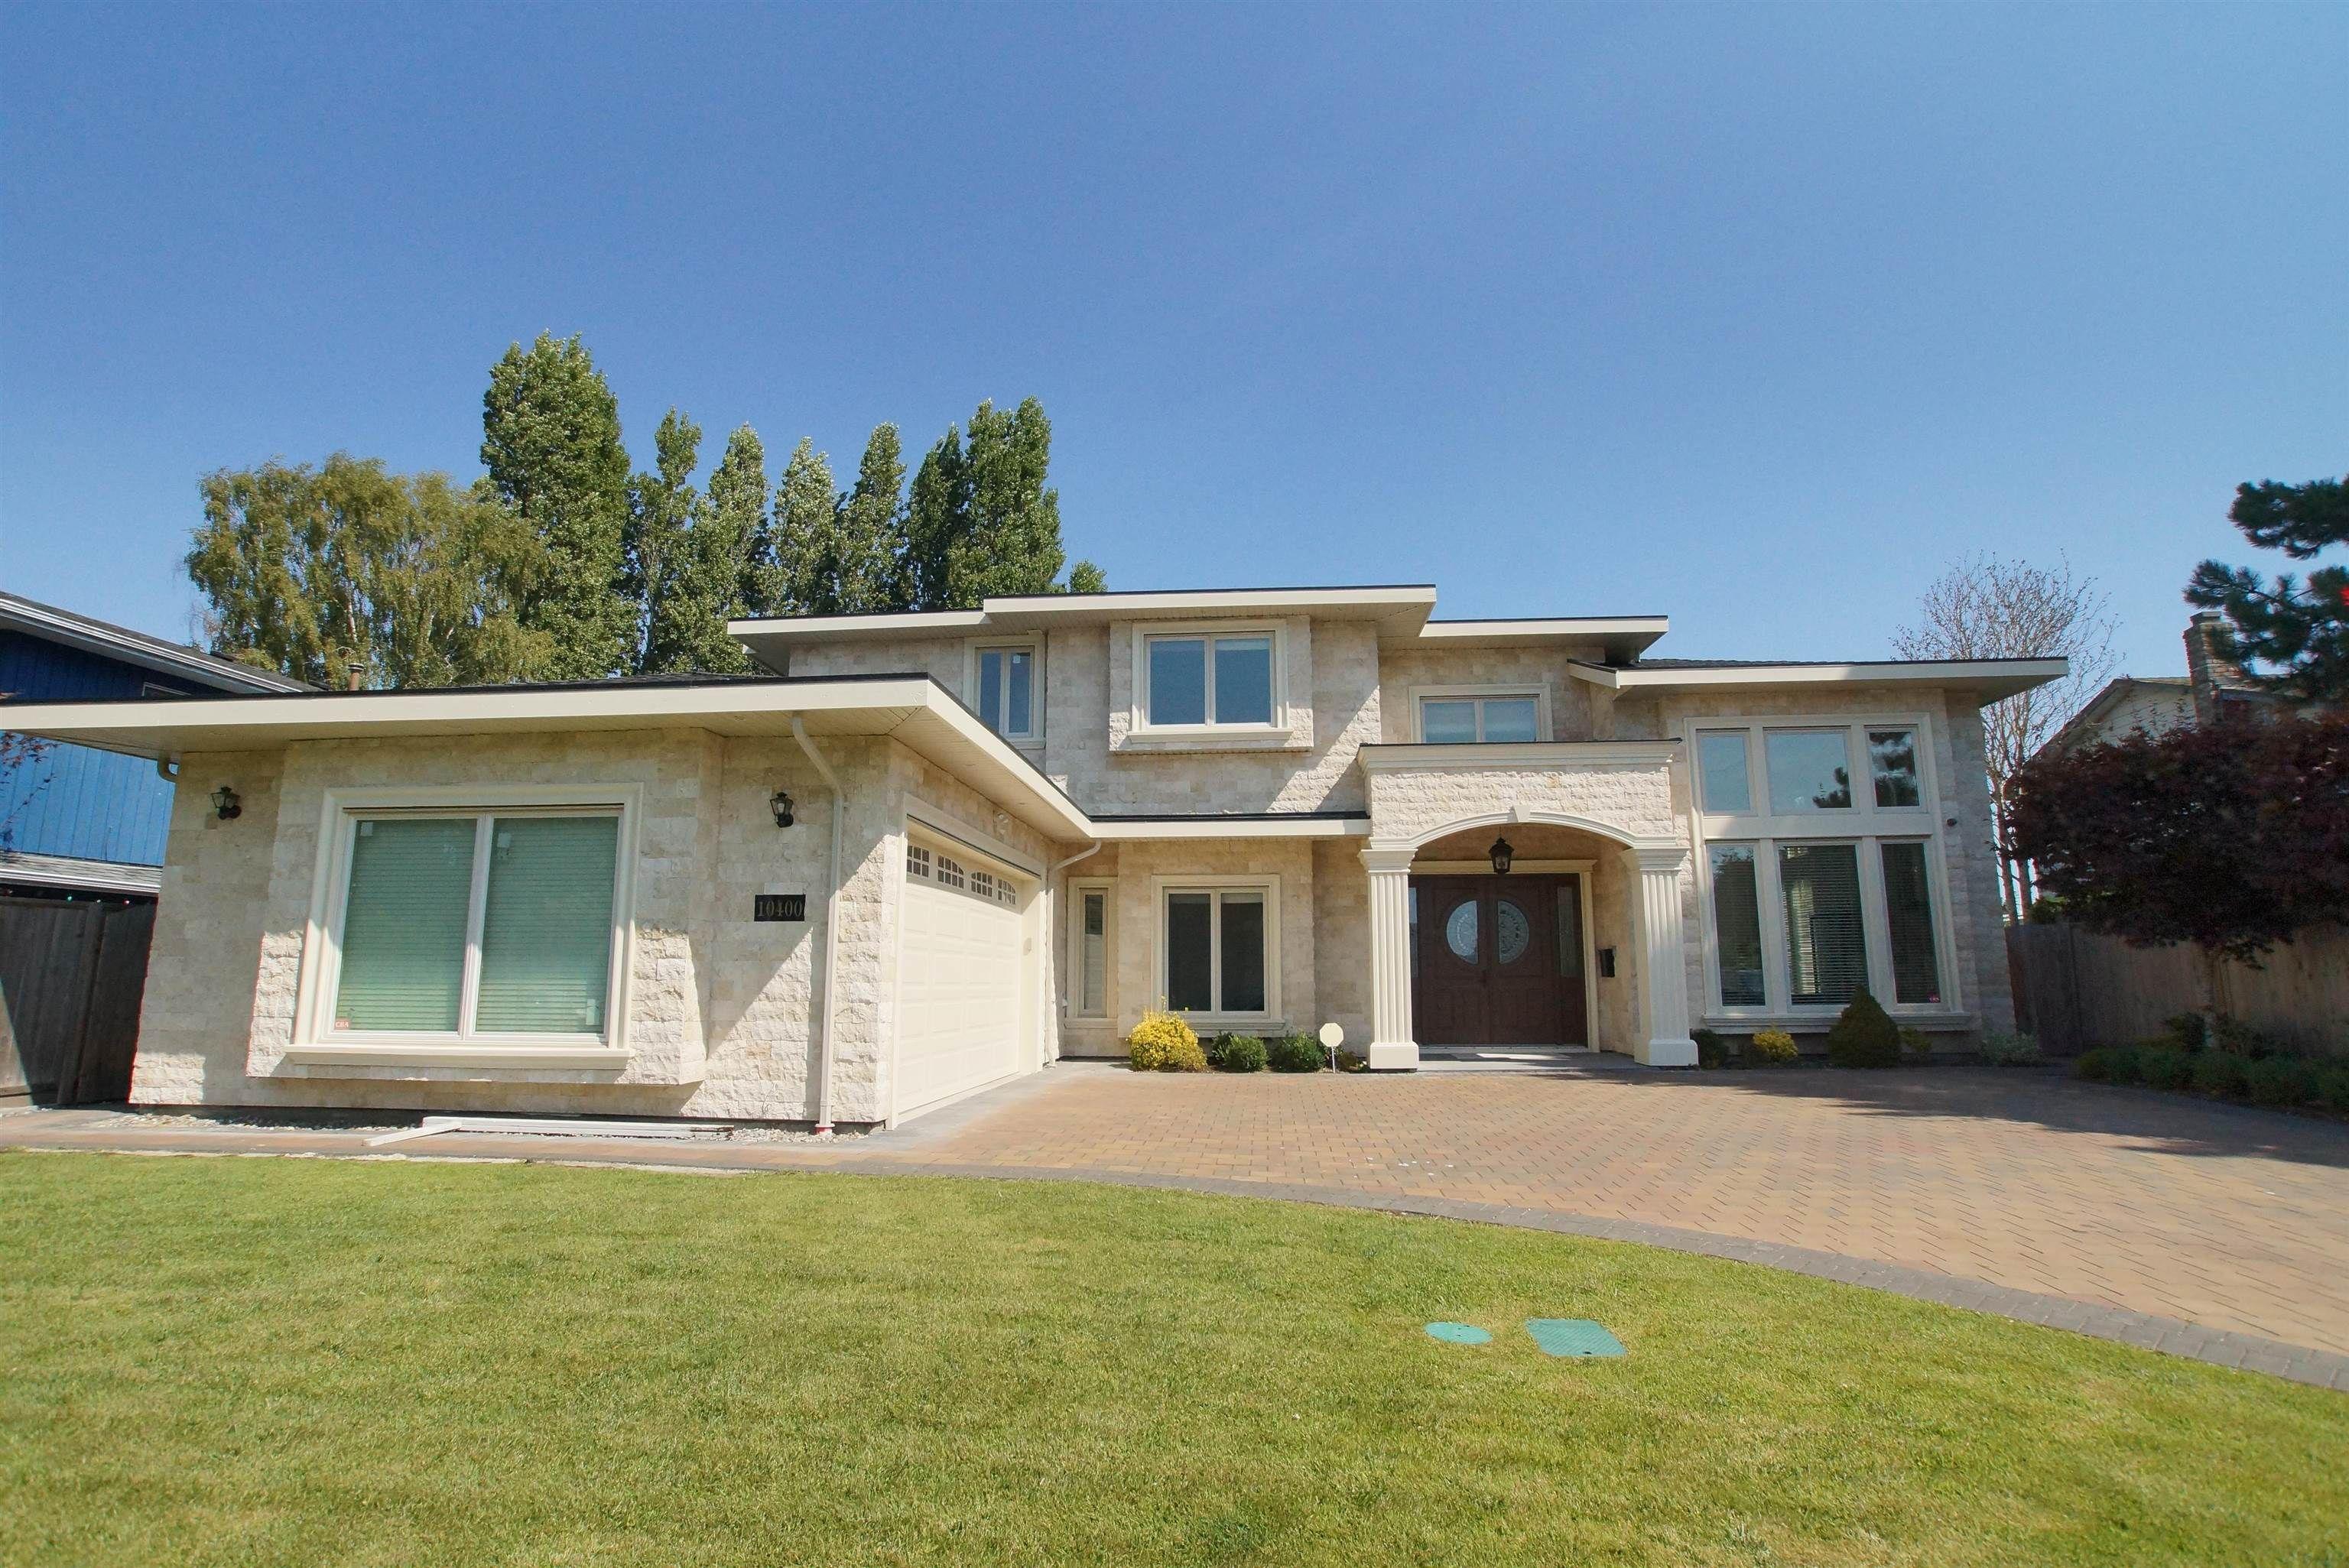 Main Photo: 10400 CORNERBROOK Crescent in Richmond: Steveston North House for sale : MLS®# R2612216